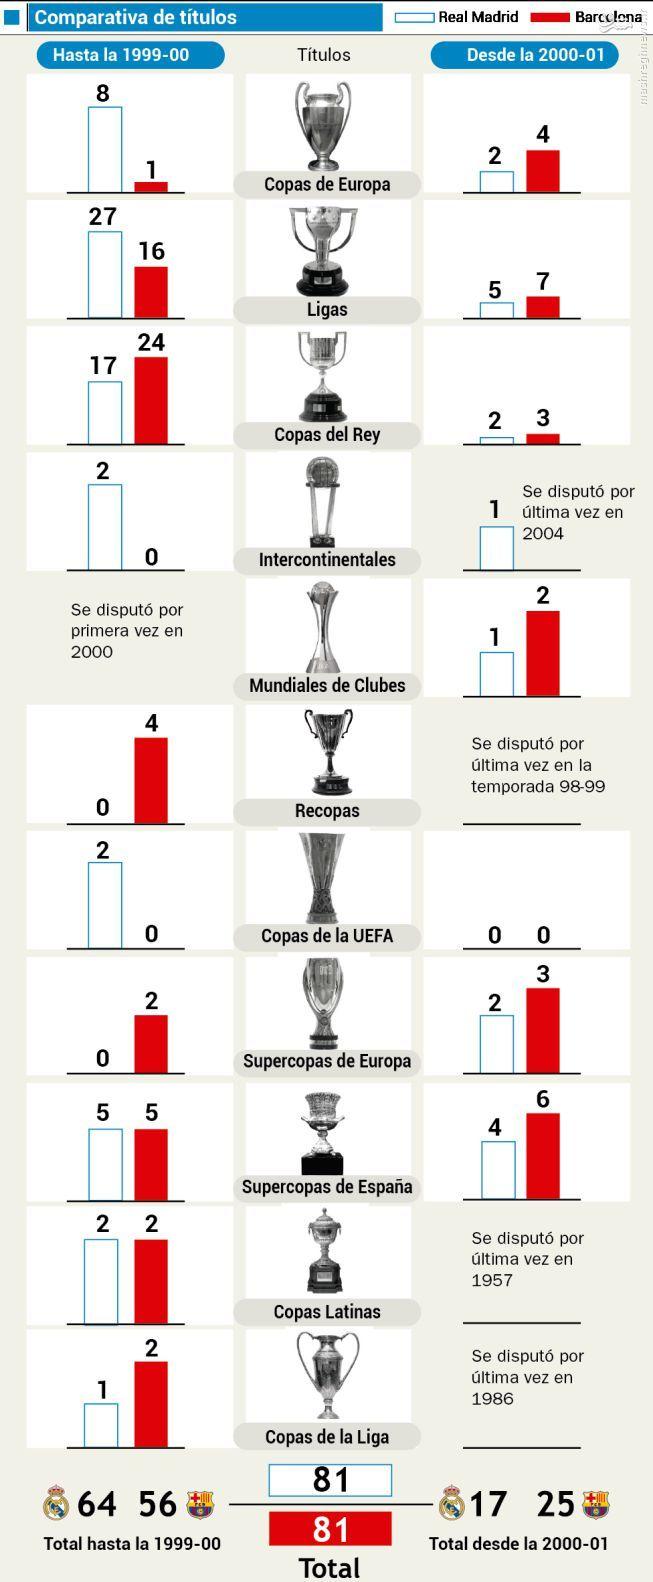 سلطه بارسلونا بر رئال مادرید در قرن 21 +عکس